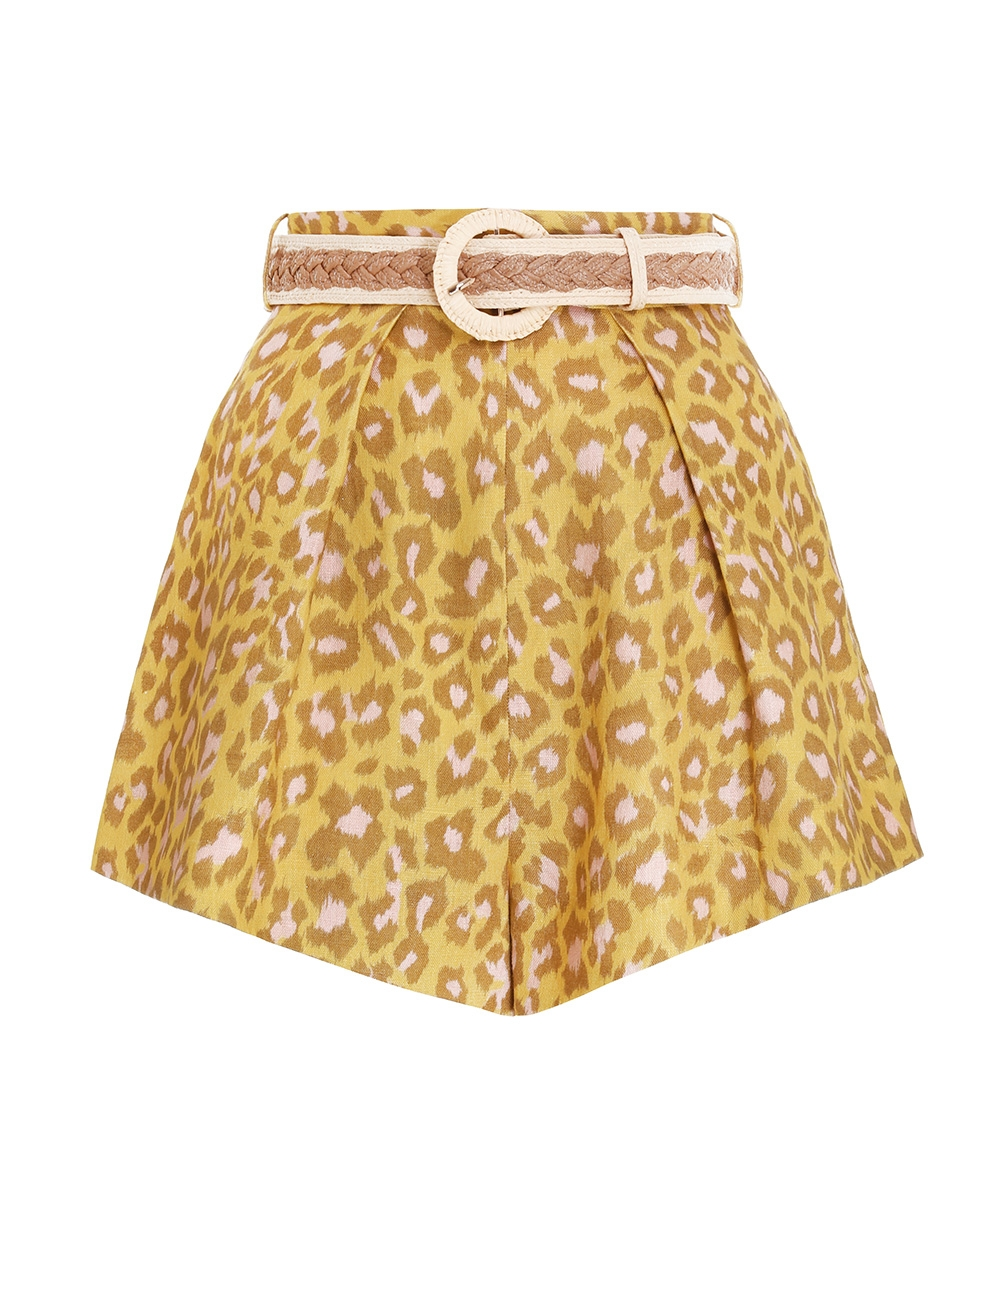 Carnaby Leopard Short